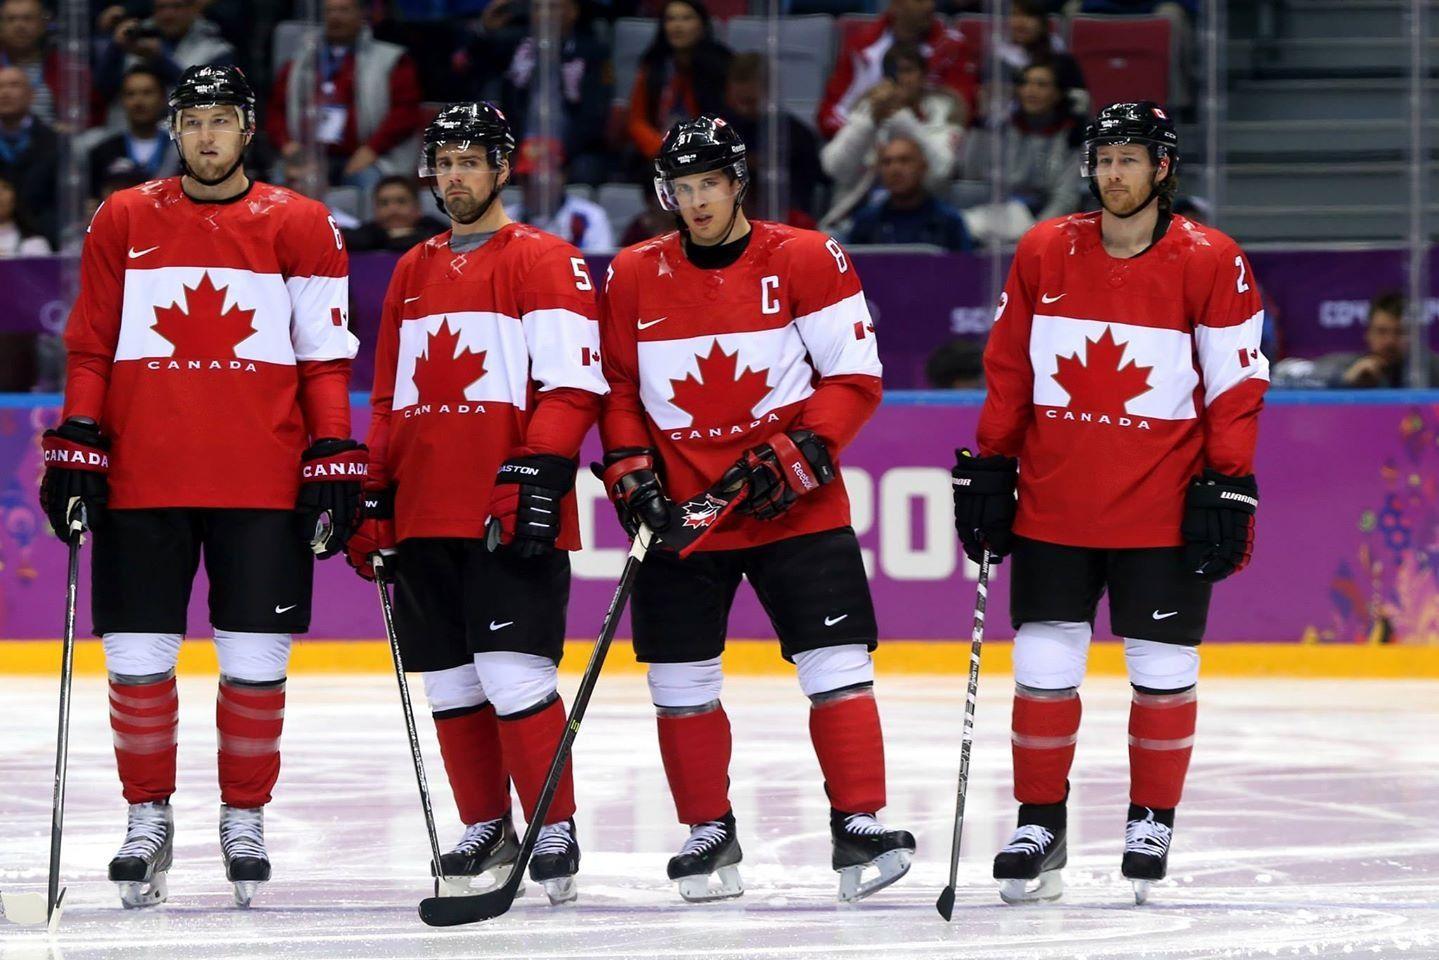 2014 Olympics Team canada hockey, Team canada, Olympic